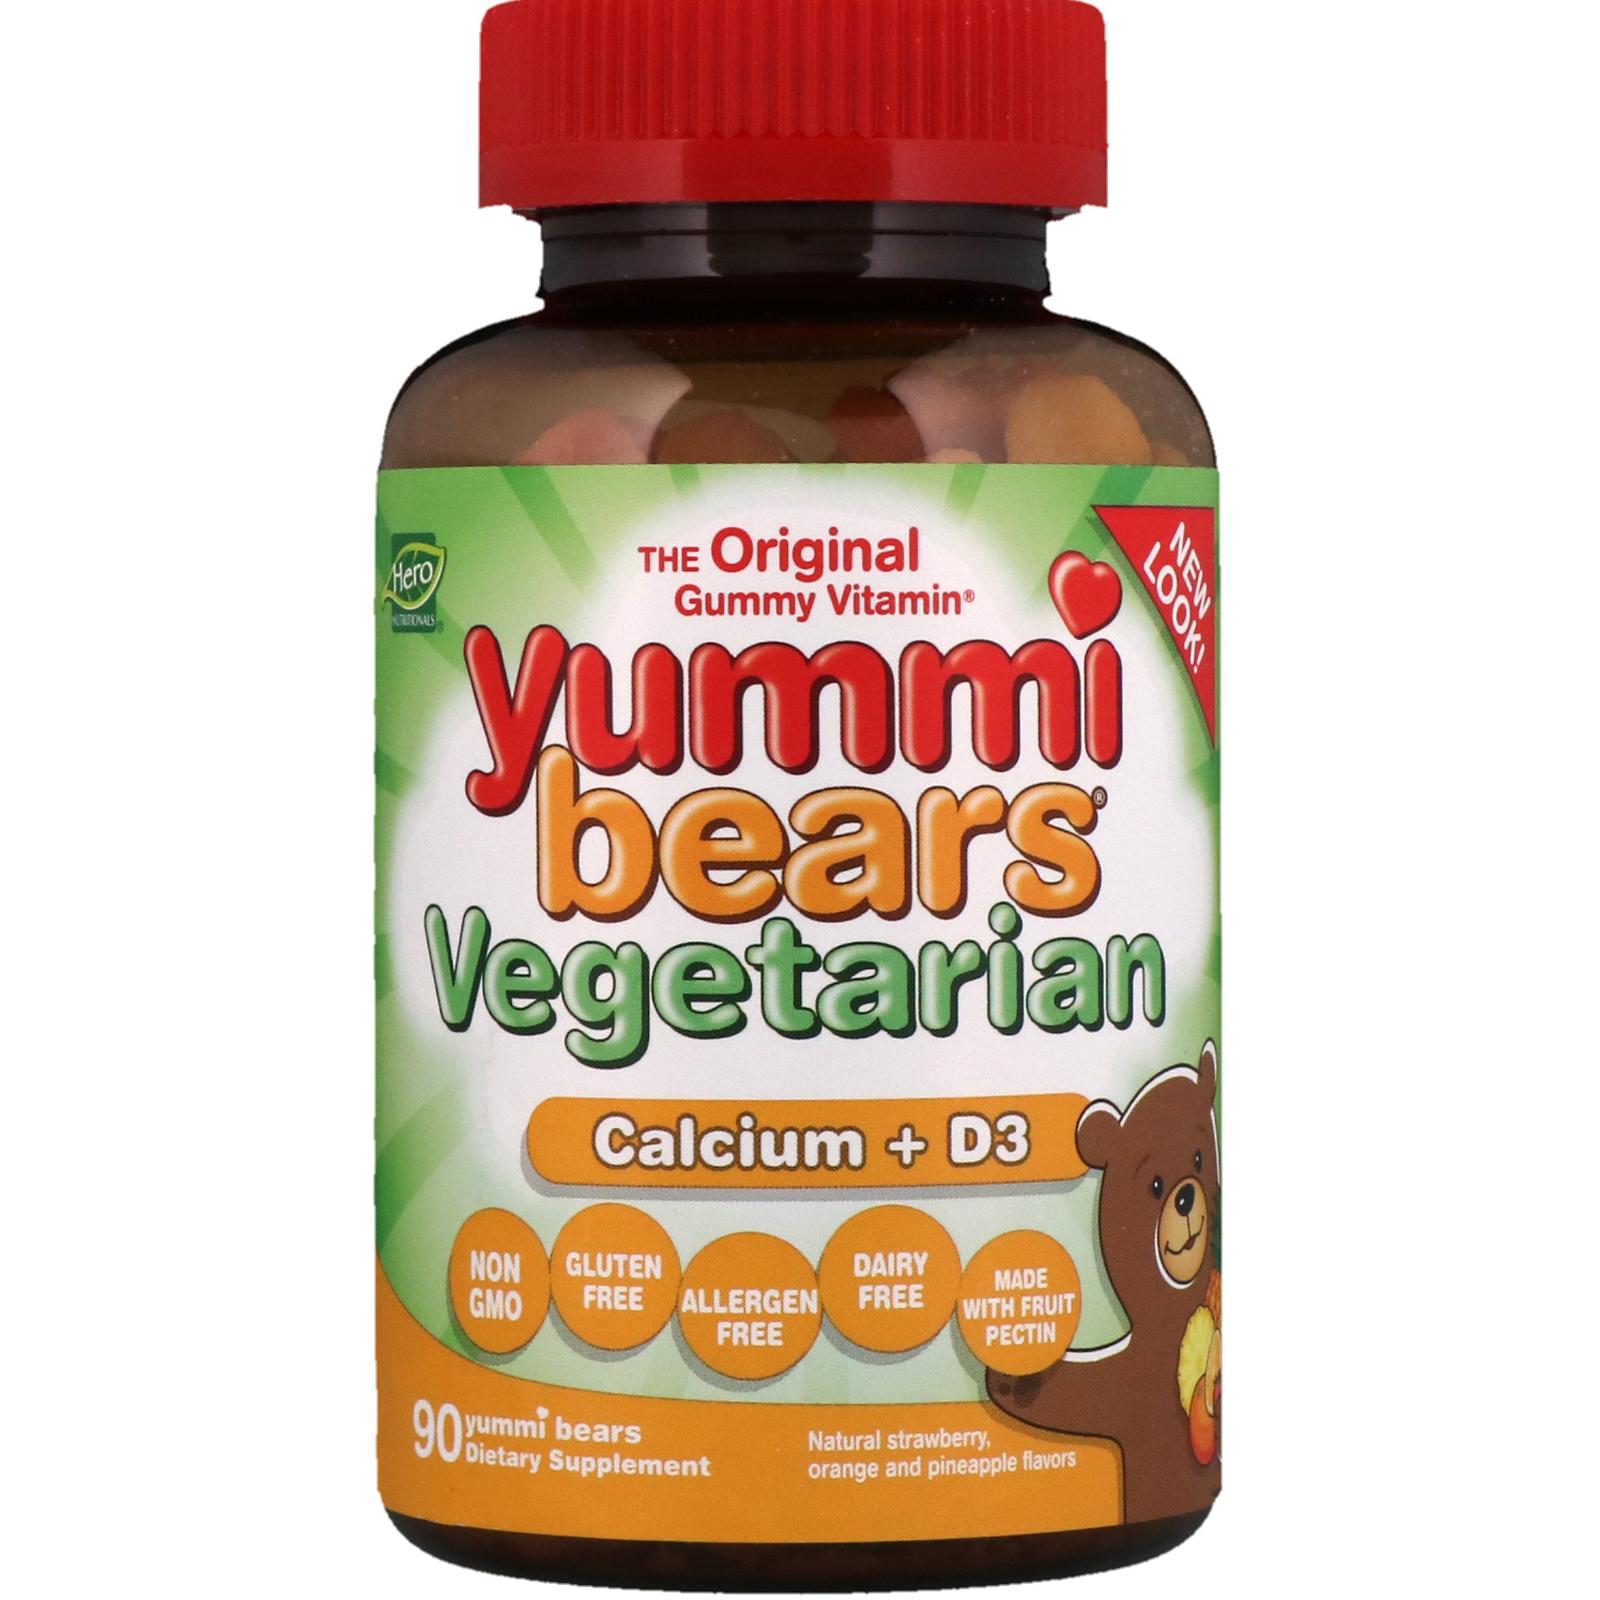 Hero Nutritional Products, Yummi Bears Vegetarian, Calcium + D3, 90